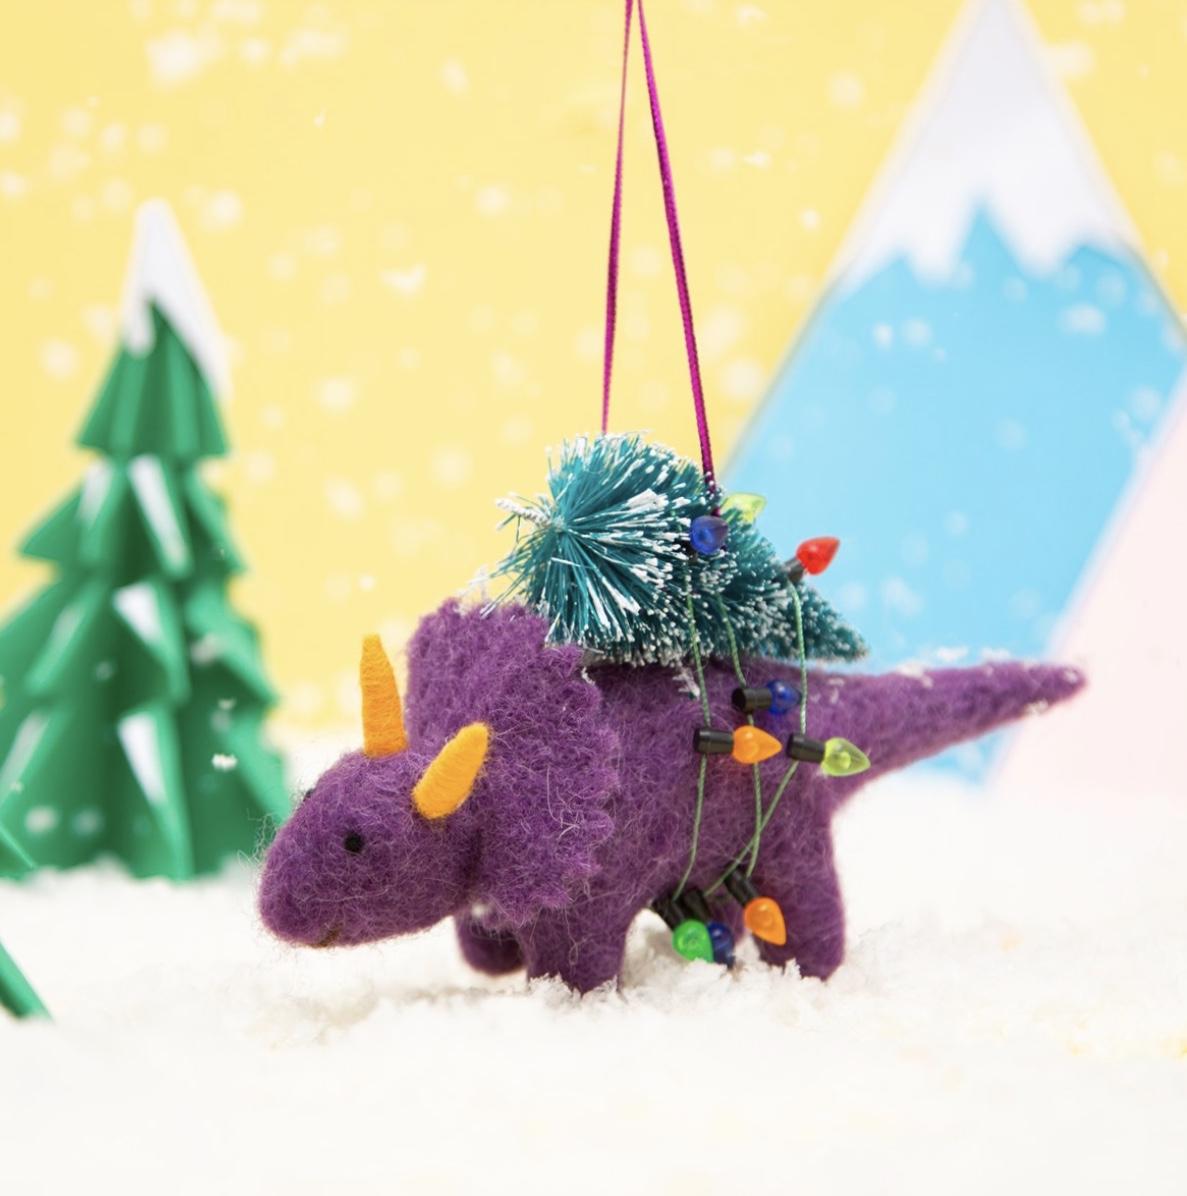 Dino with tree & lights